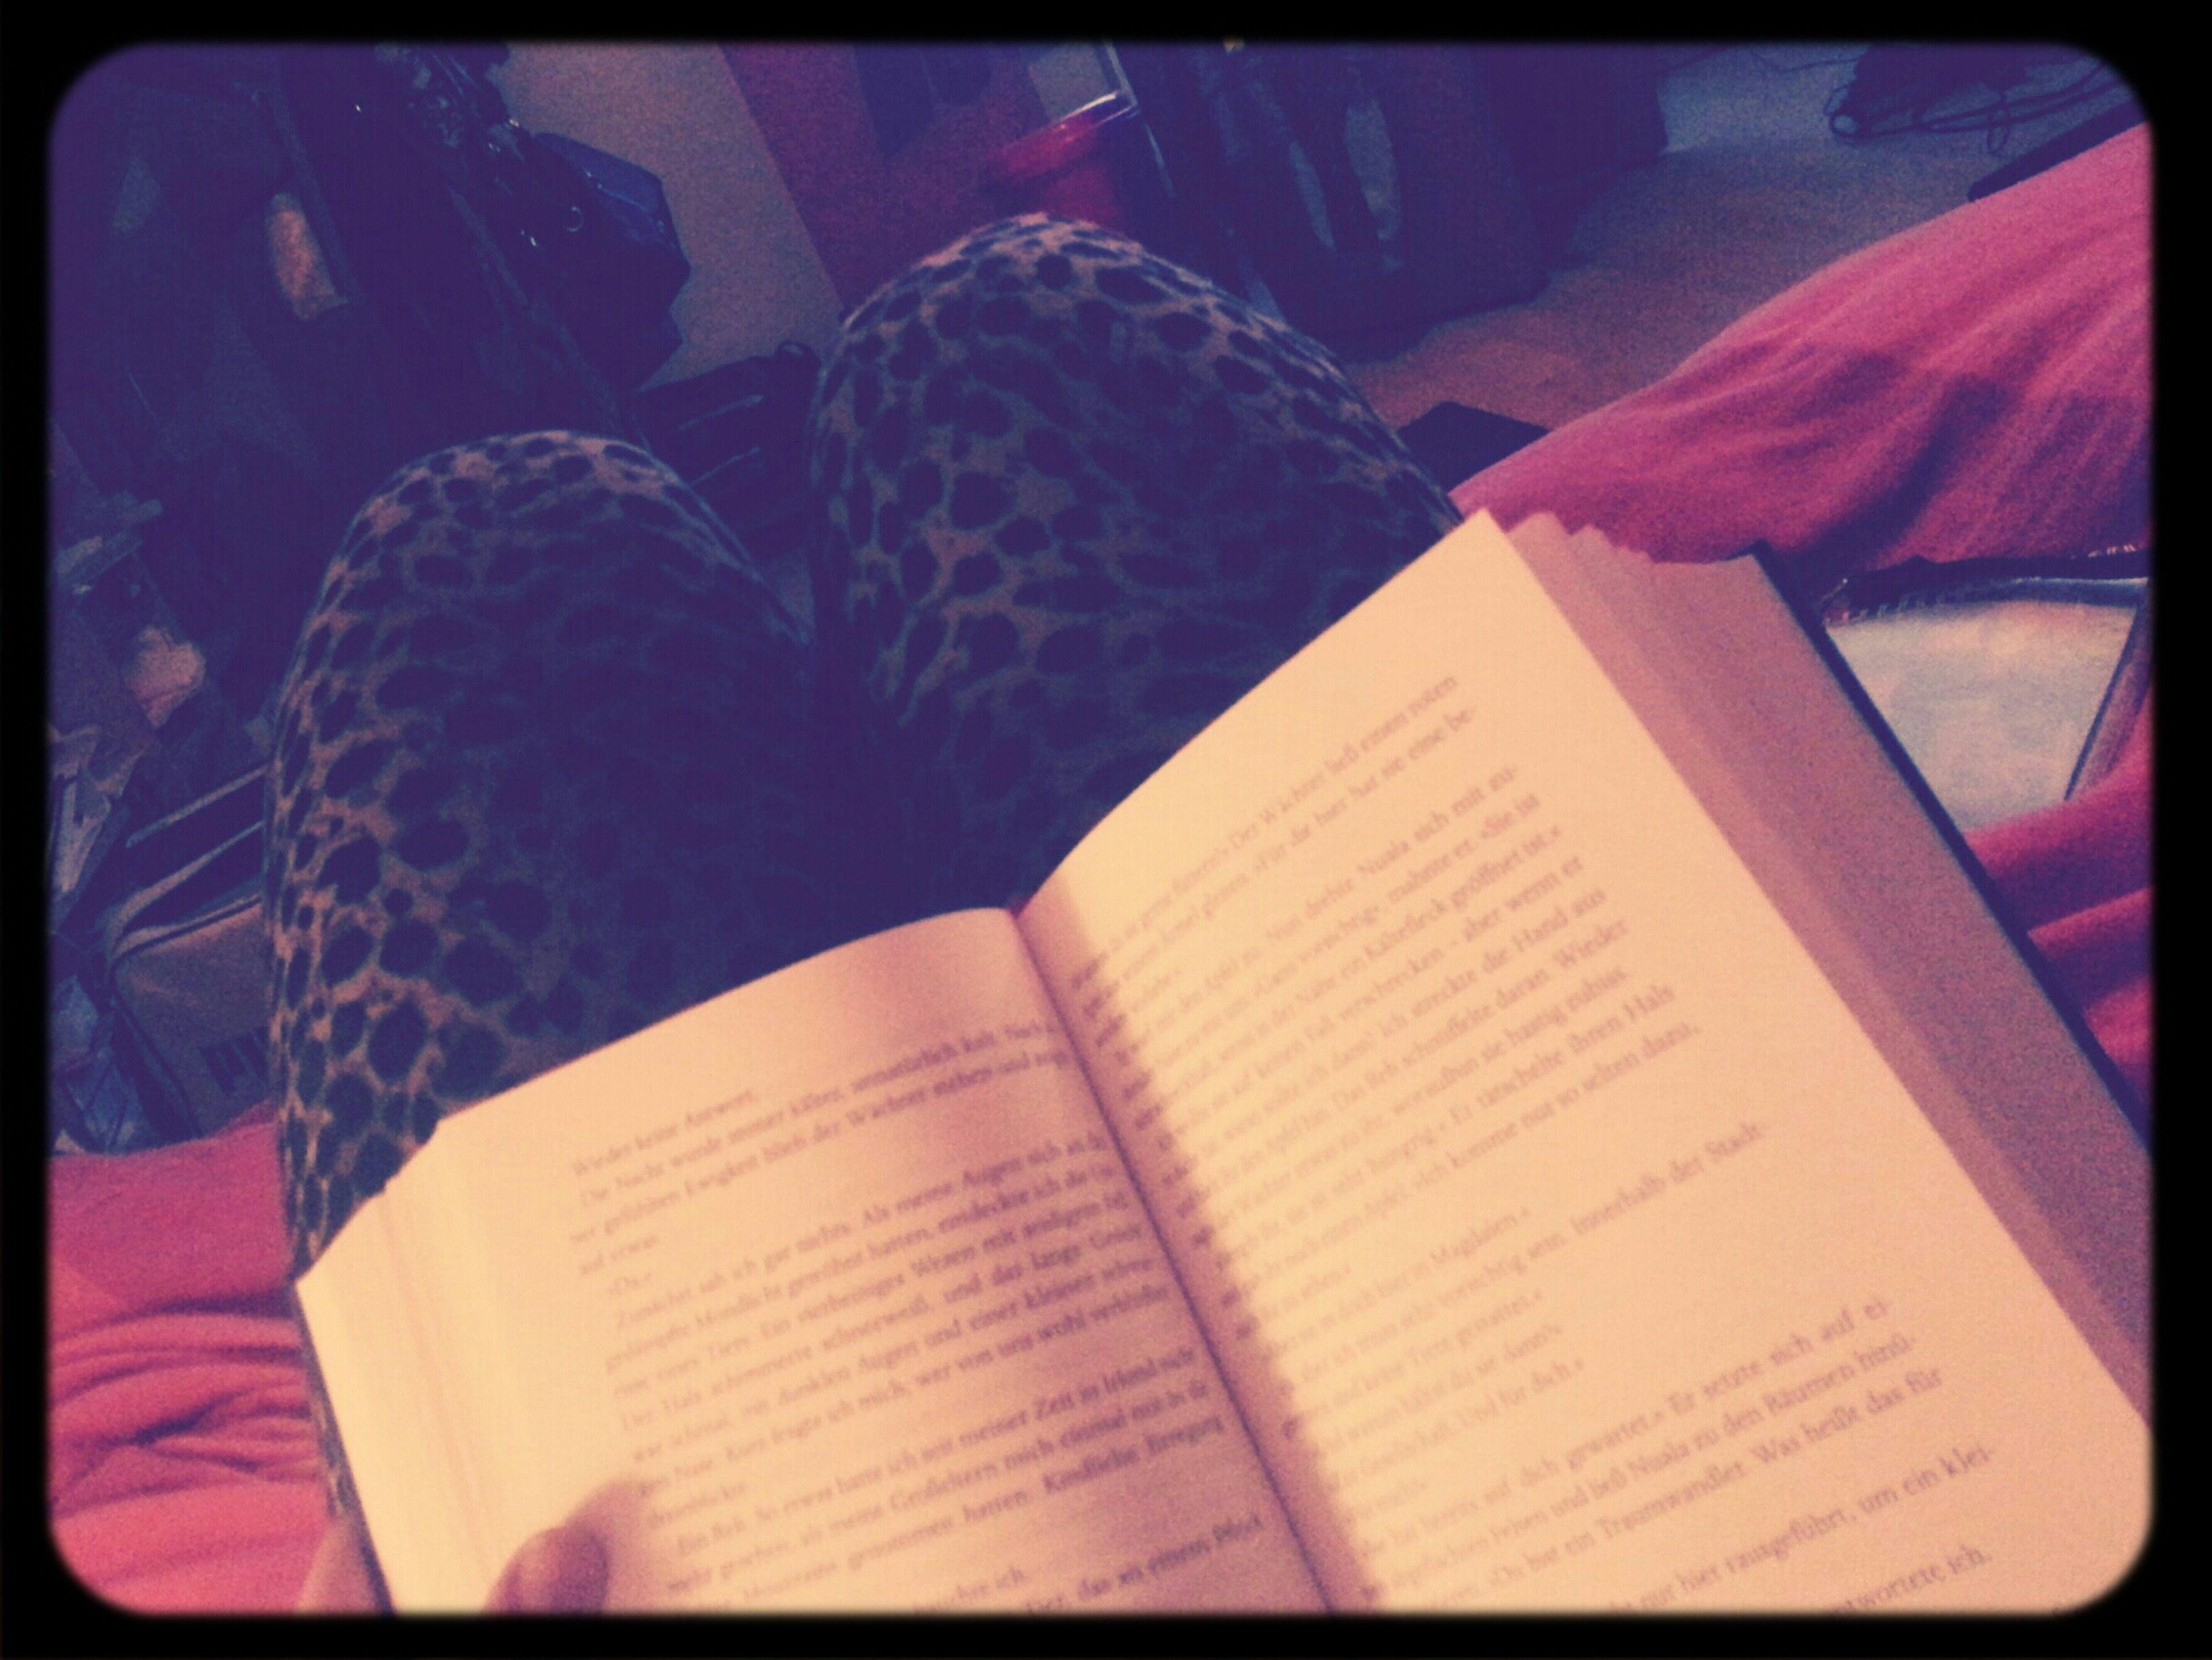 Relaxing Lesen The Bone Season Samantha Shannon